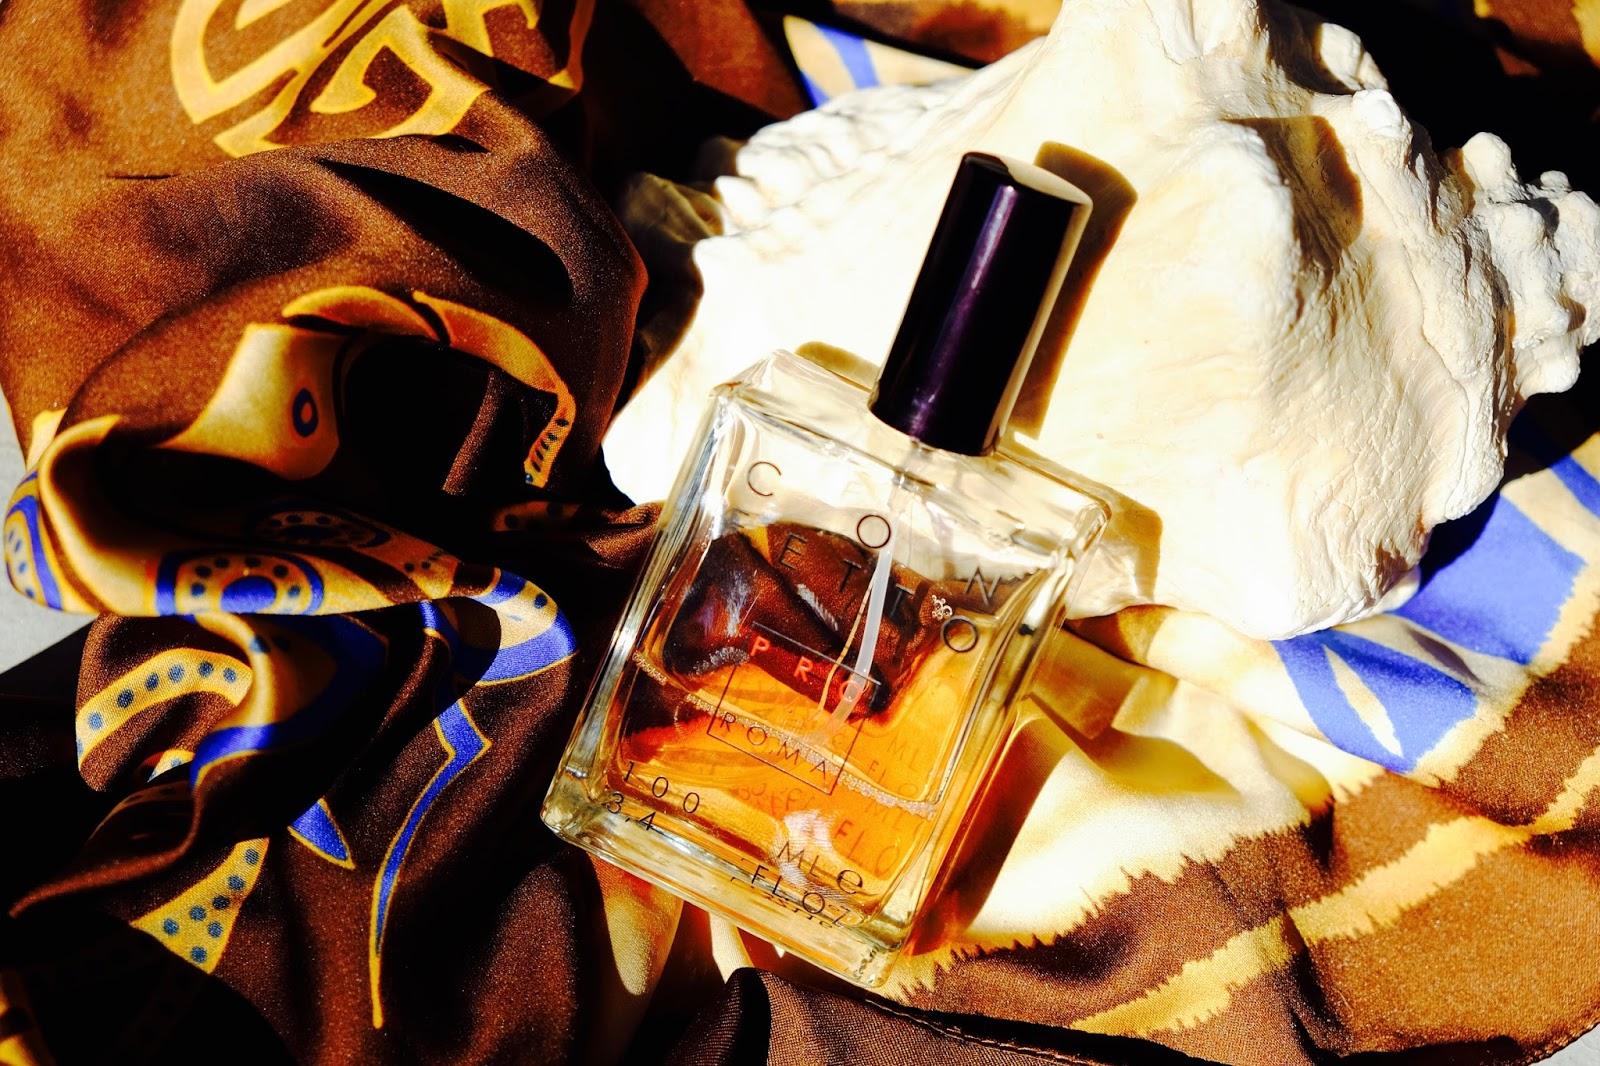 Duft, Parfum Blog Düsseldorf